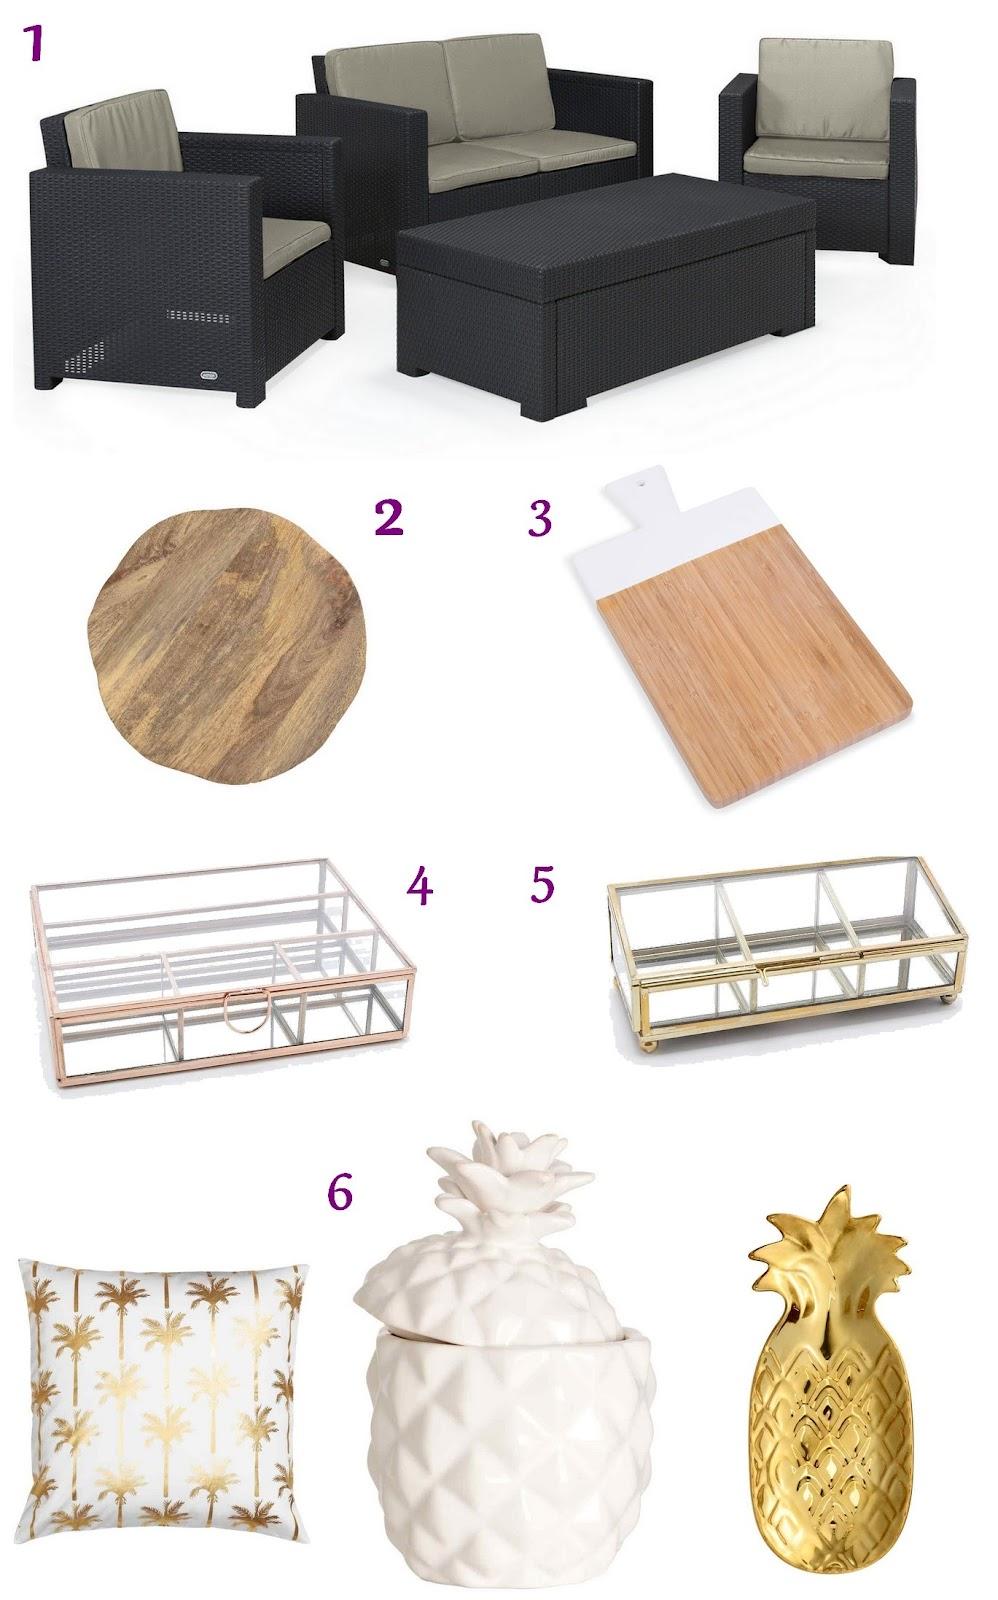 décoration, alinea, hetm, urban outfitters